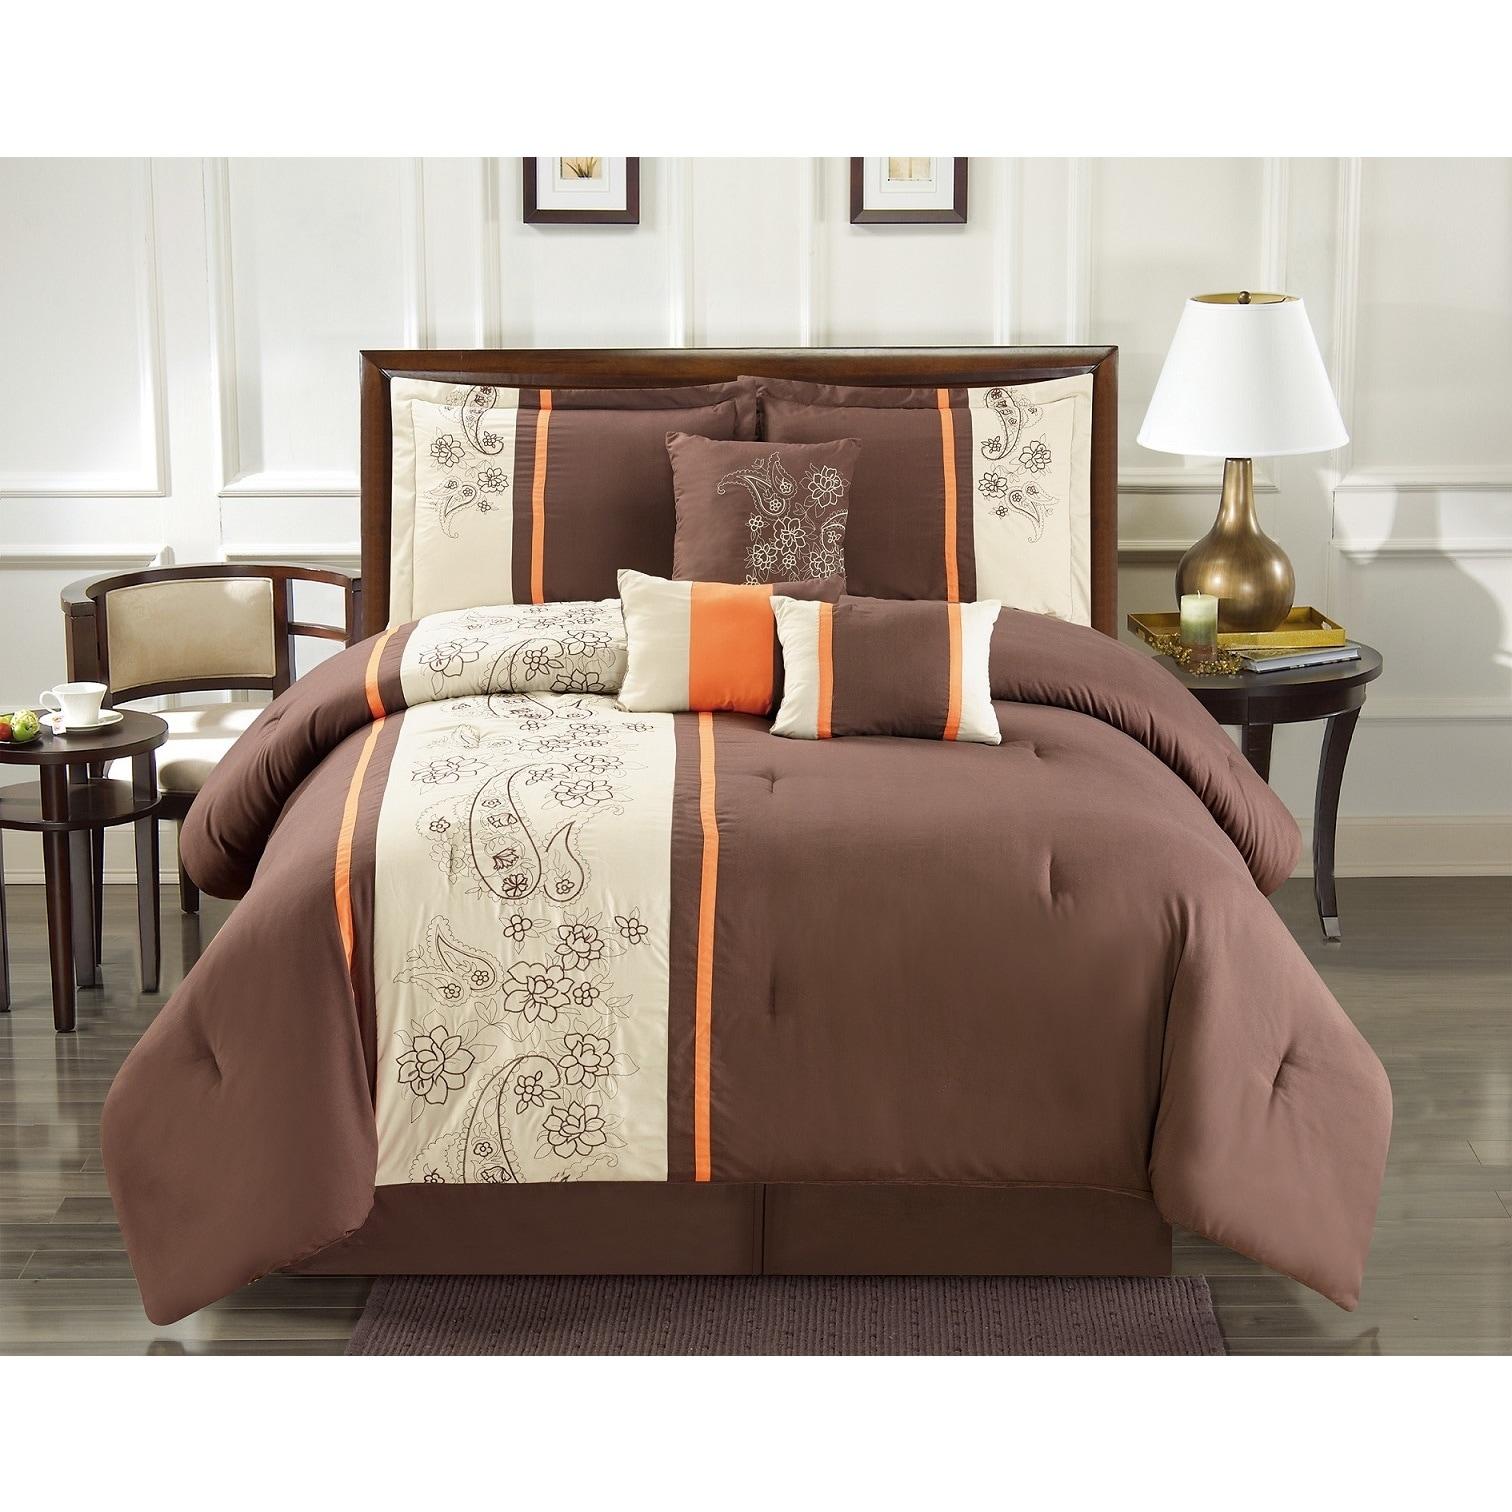 Elegant Jacquard Brown Copper Floral Paisley 7 pcs Cal King Queen Comforter Set